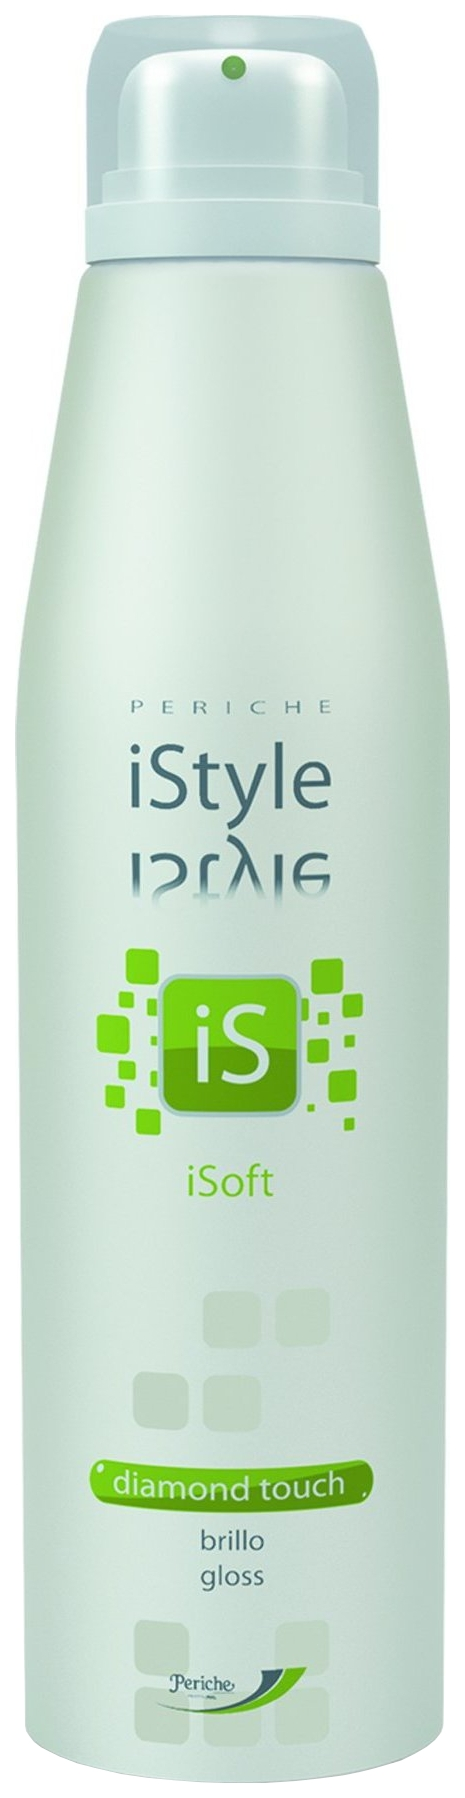 Блеск для волос PERICHE iStyle iSoft Diamond Touch 150 мл